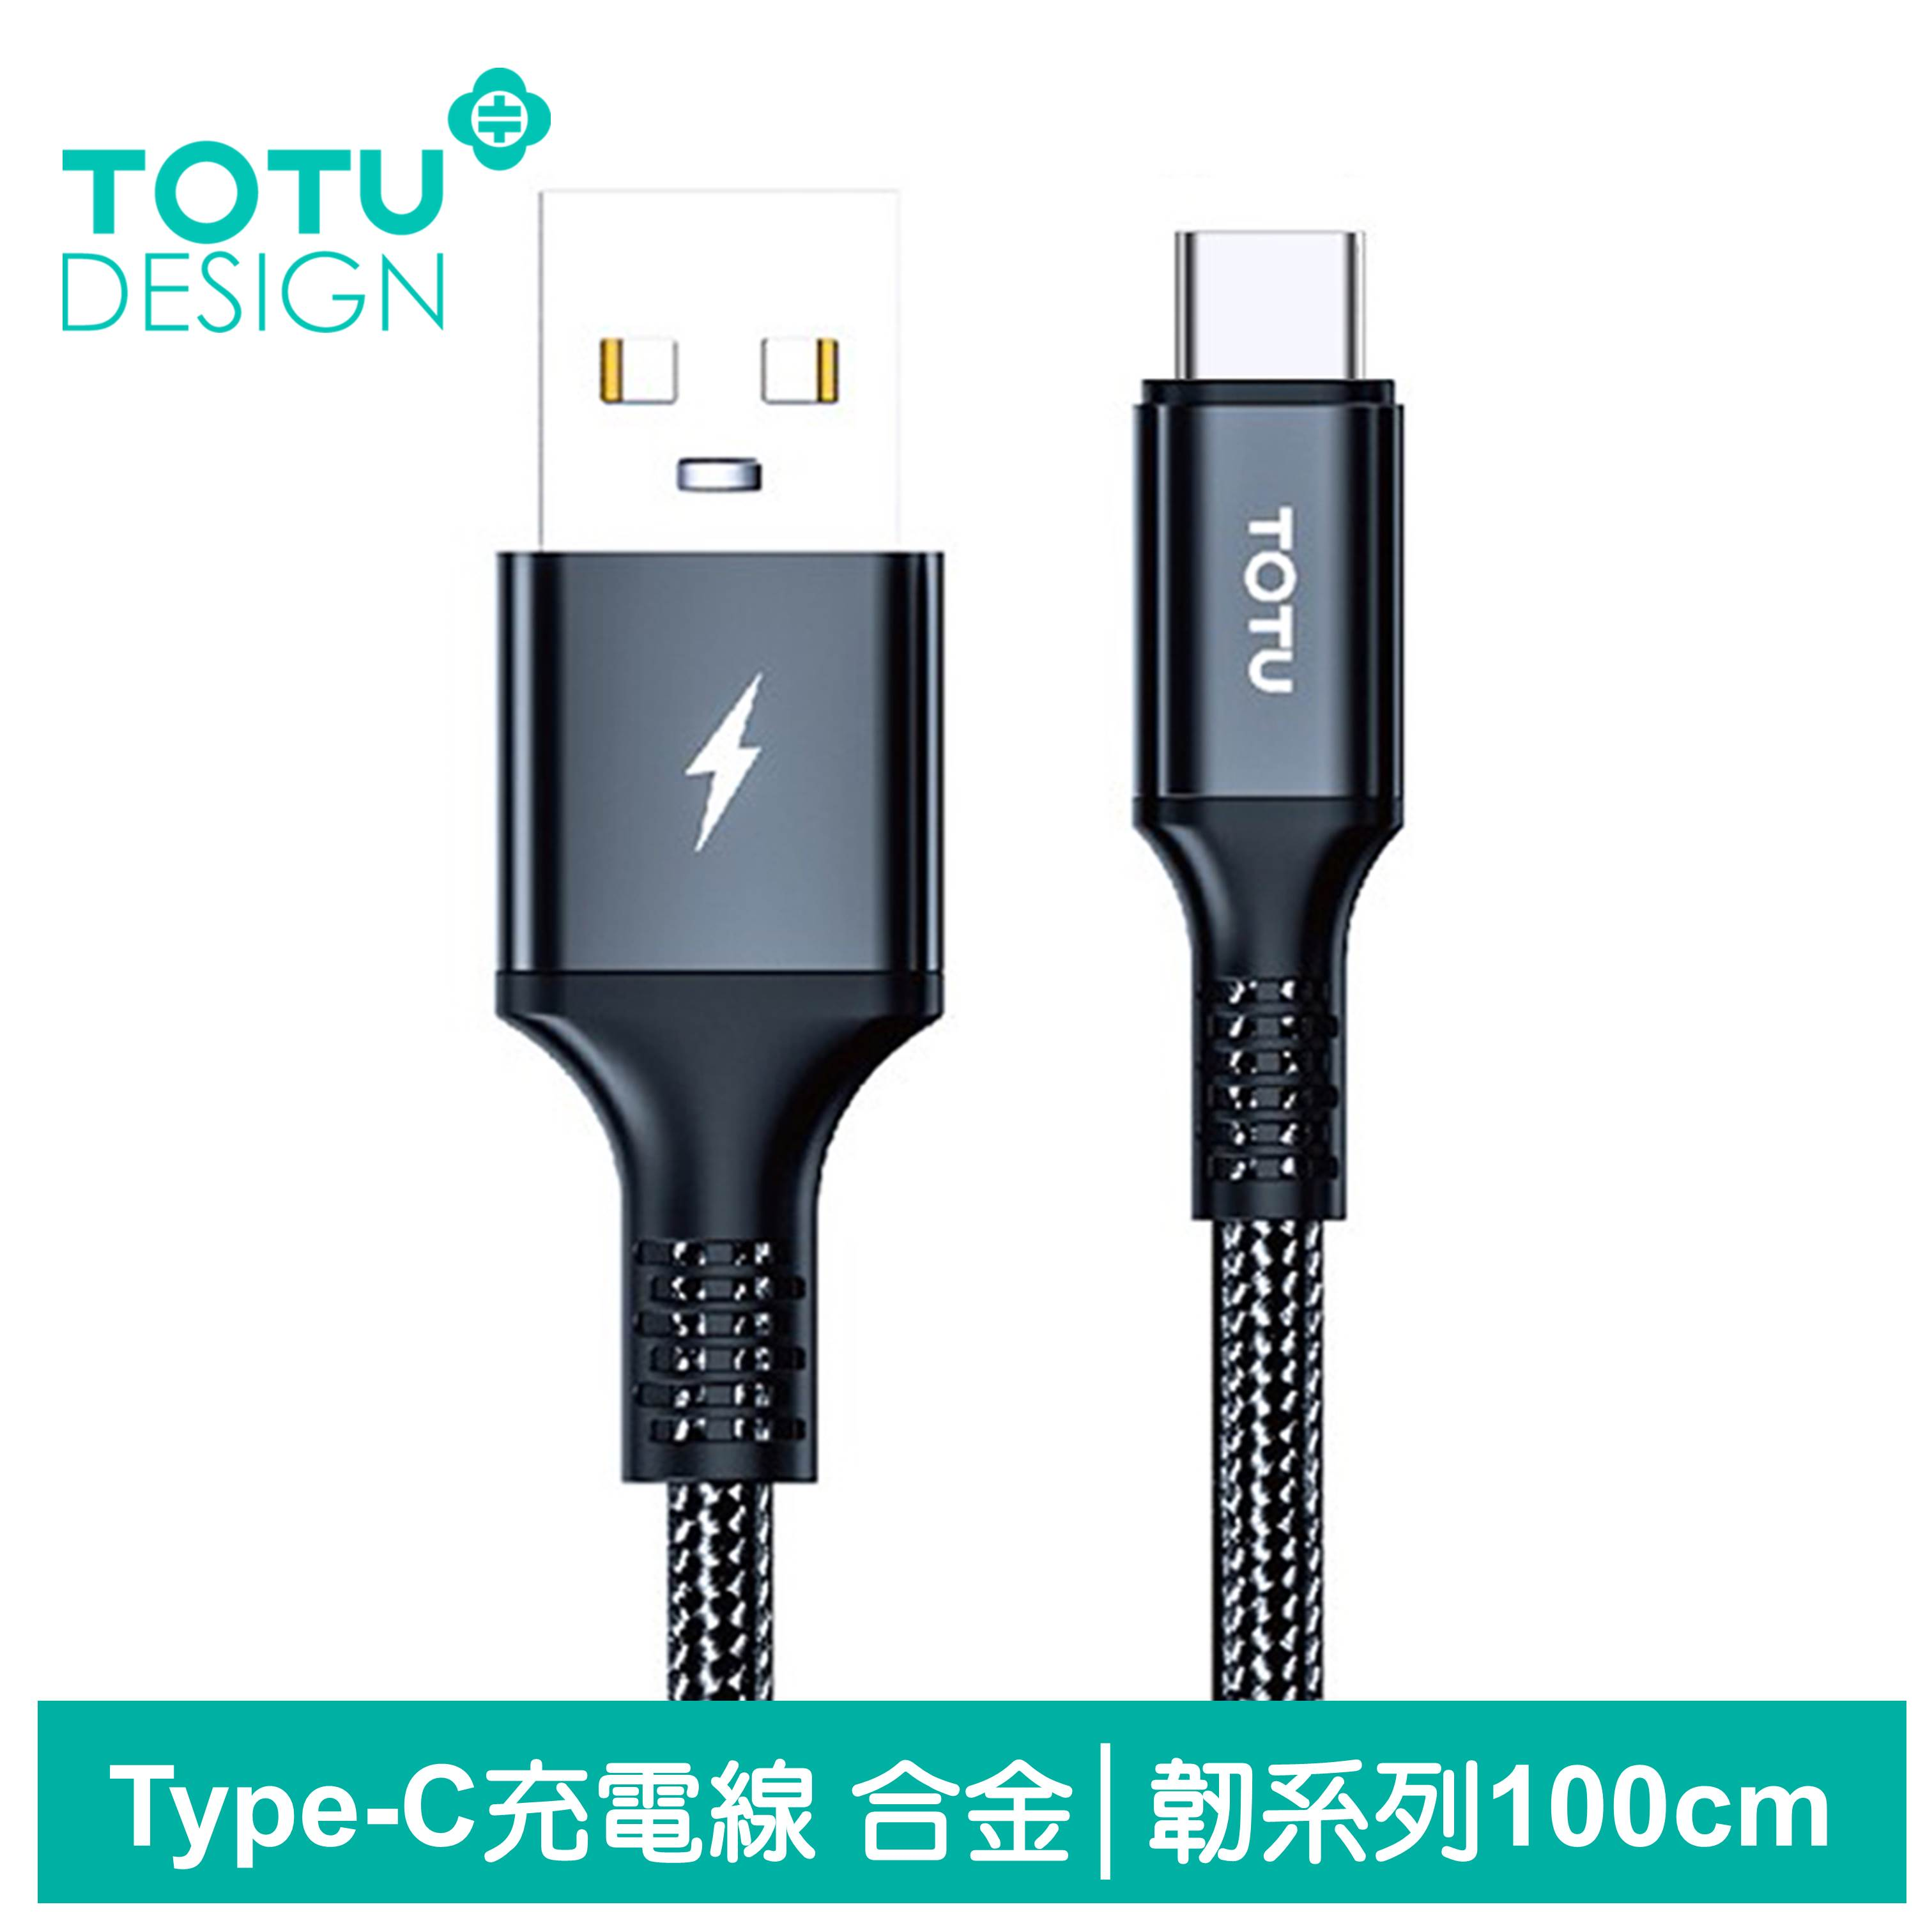 TOTU台灣官方 Type-C充電線傳輸線快充線編織線 2A快充 韌系列 100cm 黑色